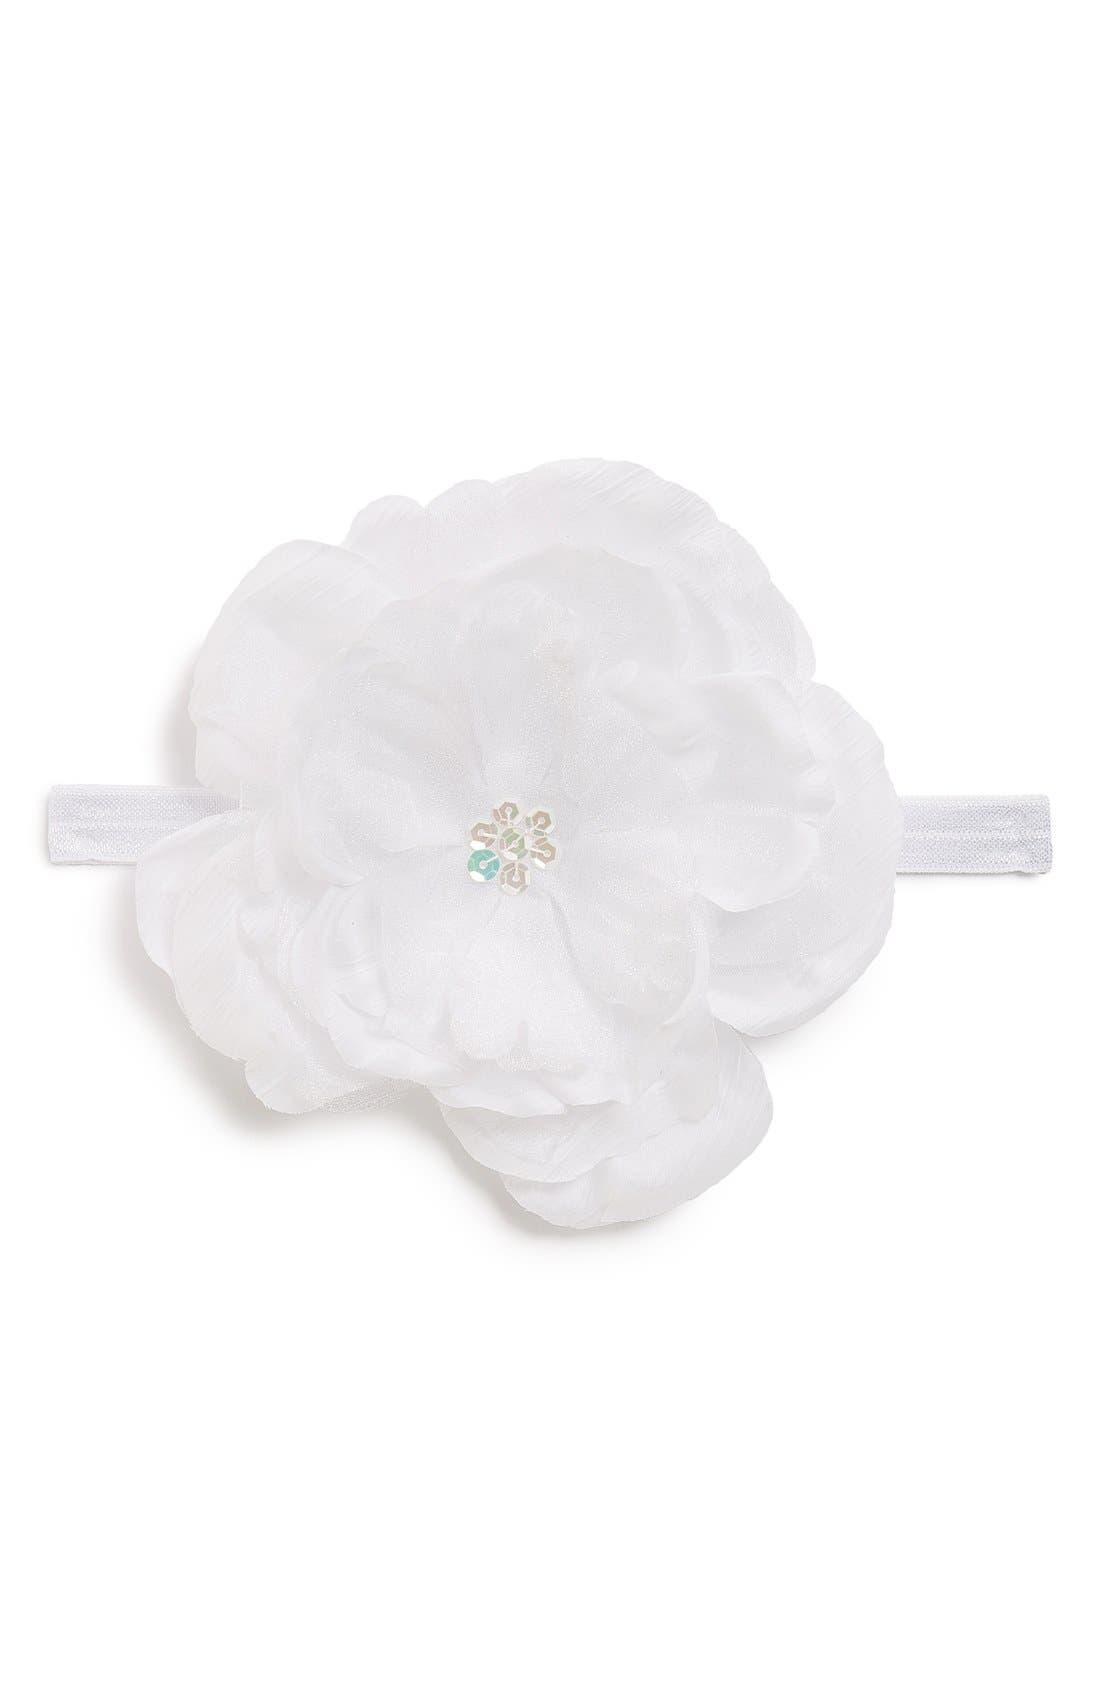 Flower Headband,                             Main thumbnail 1, color,